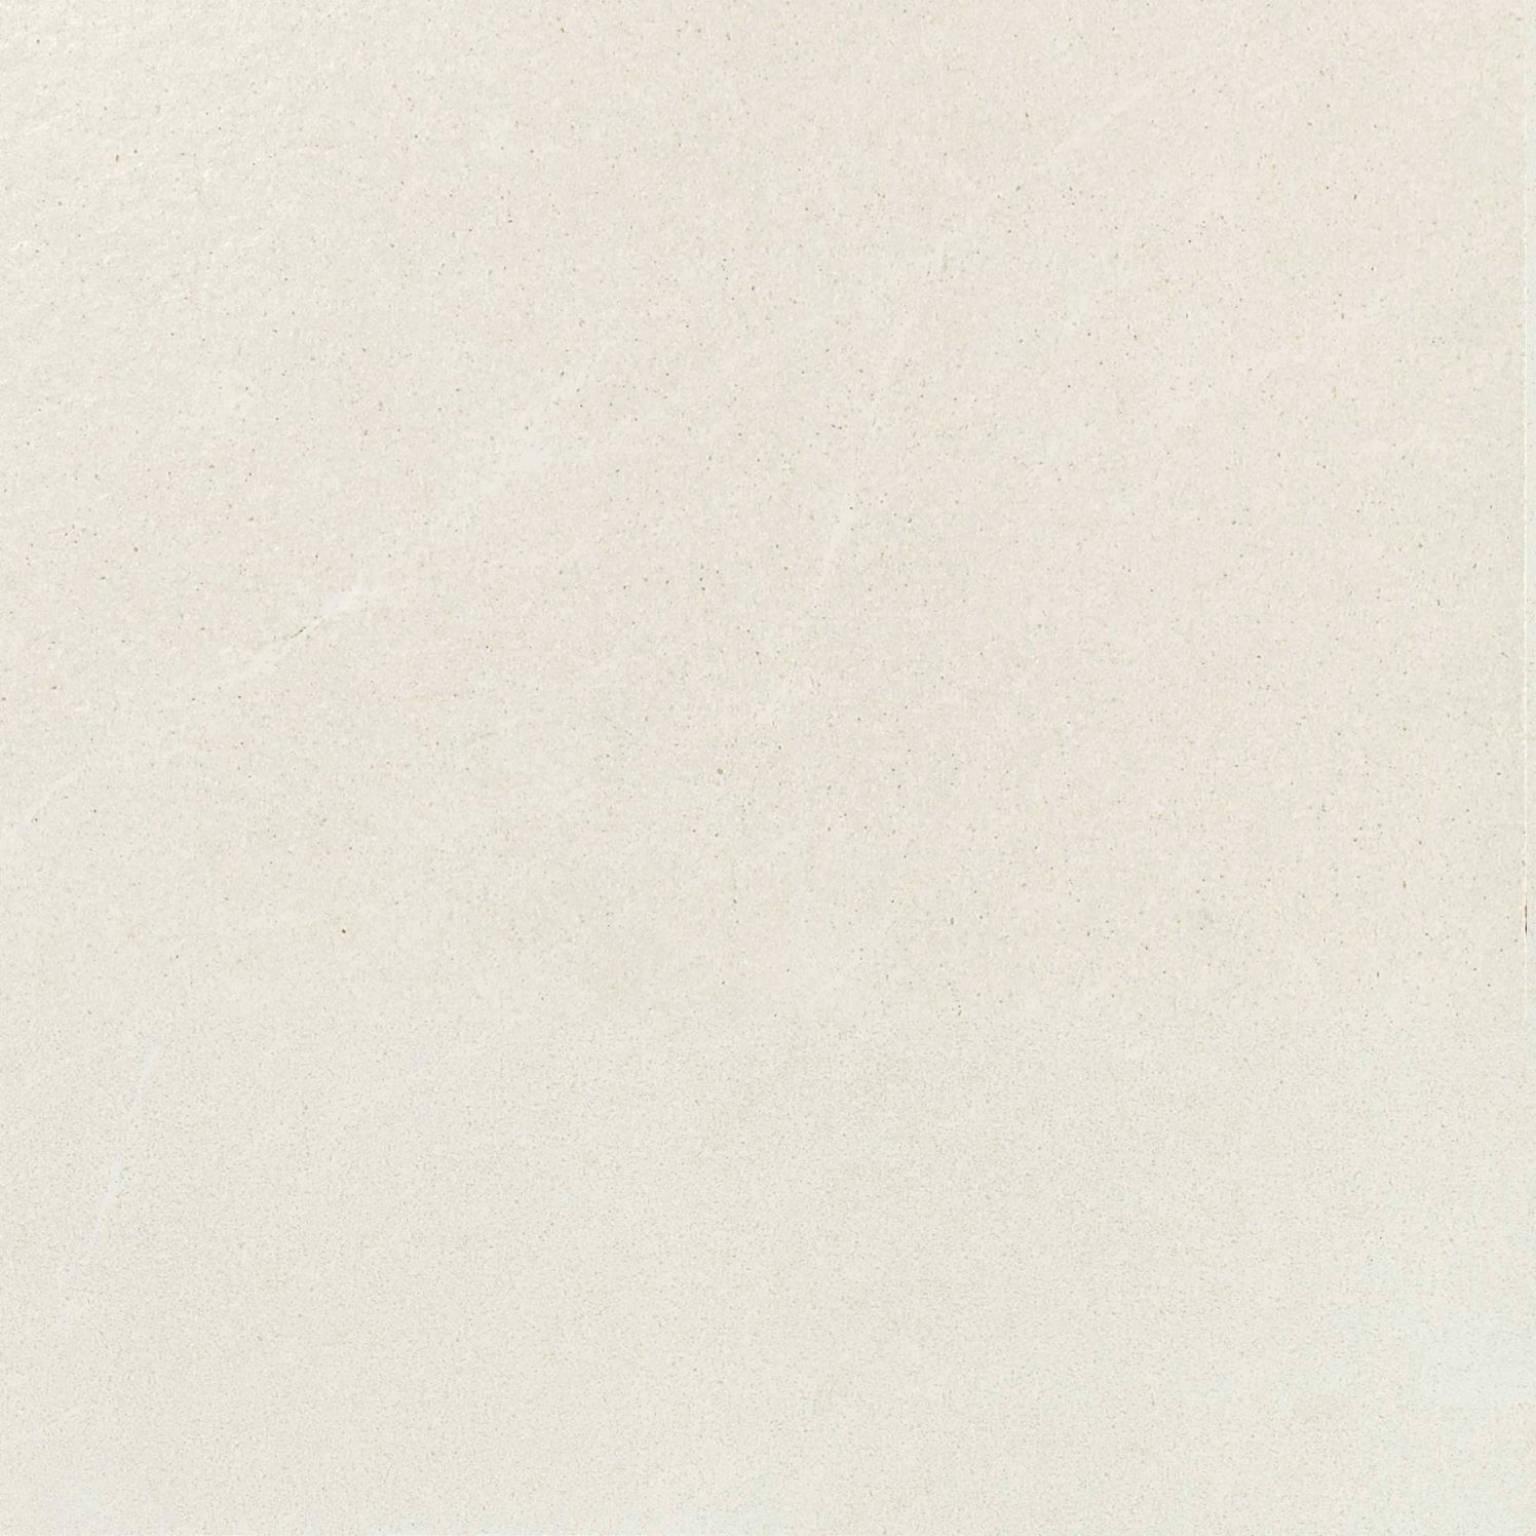 Contact White 60x60 | Newker